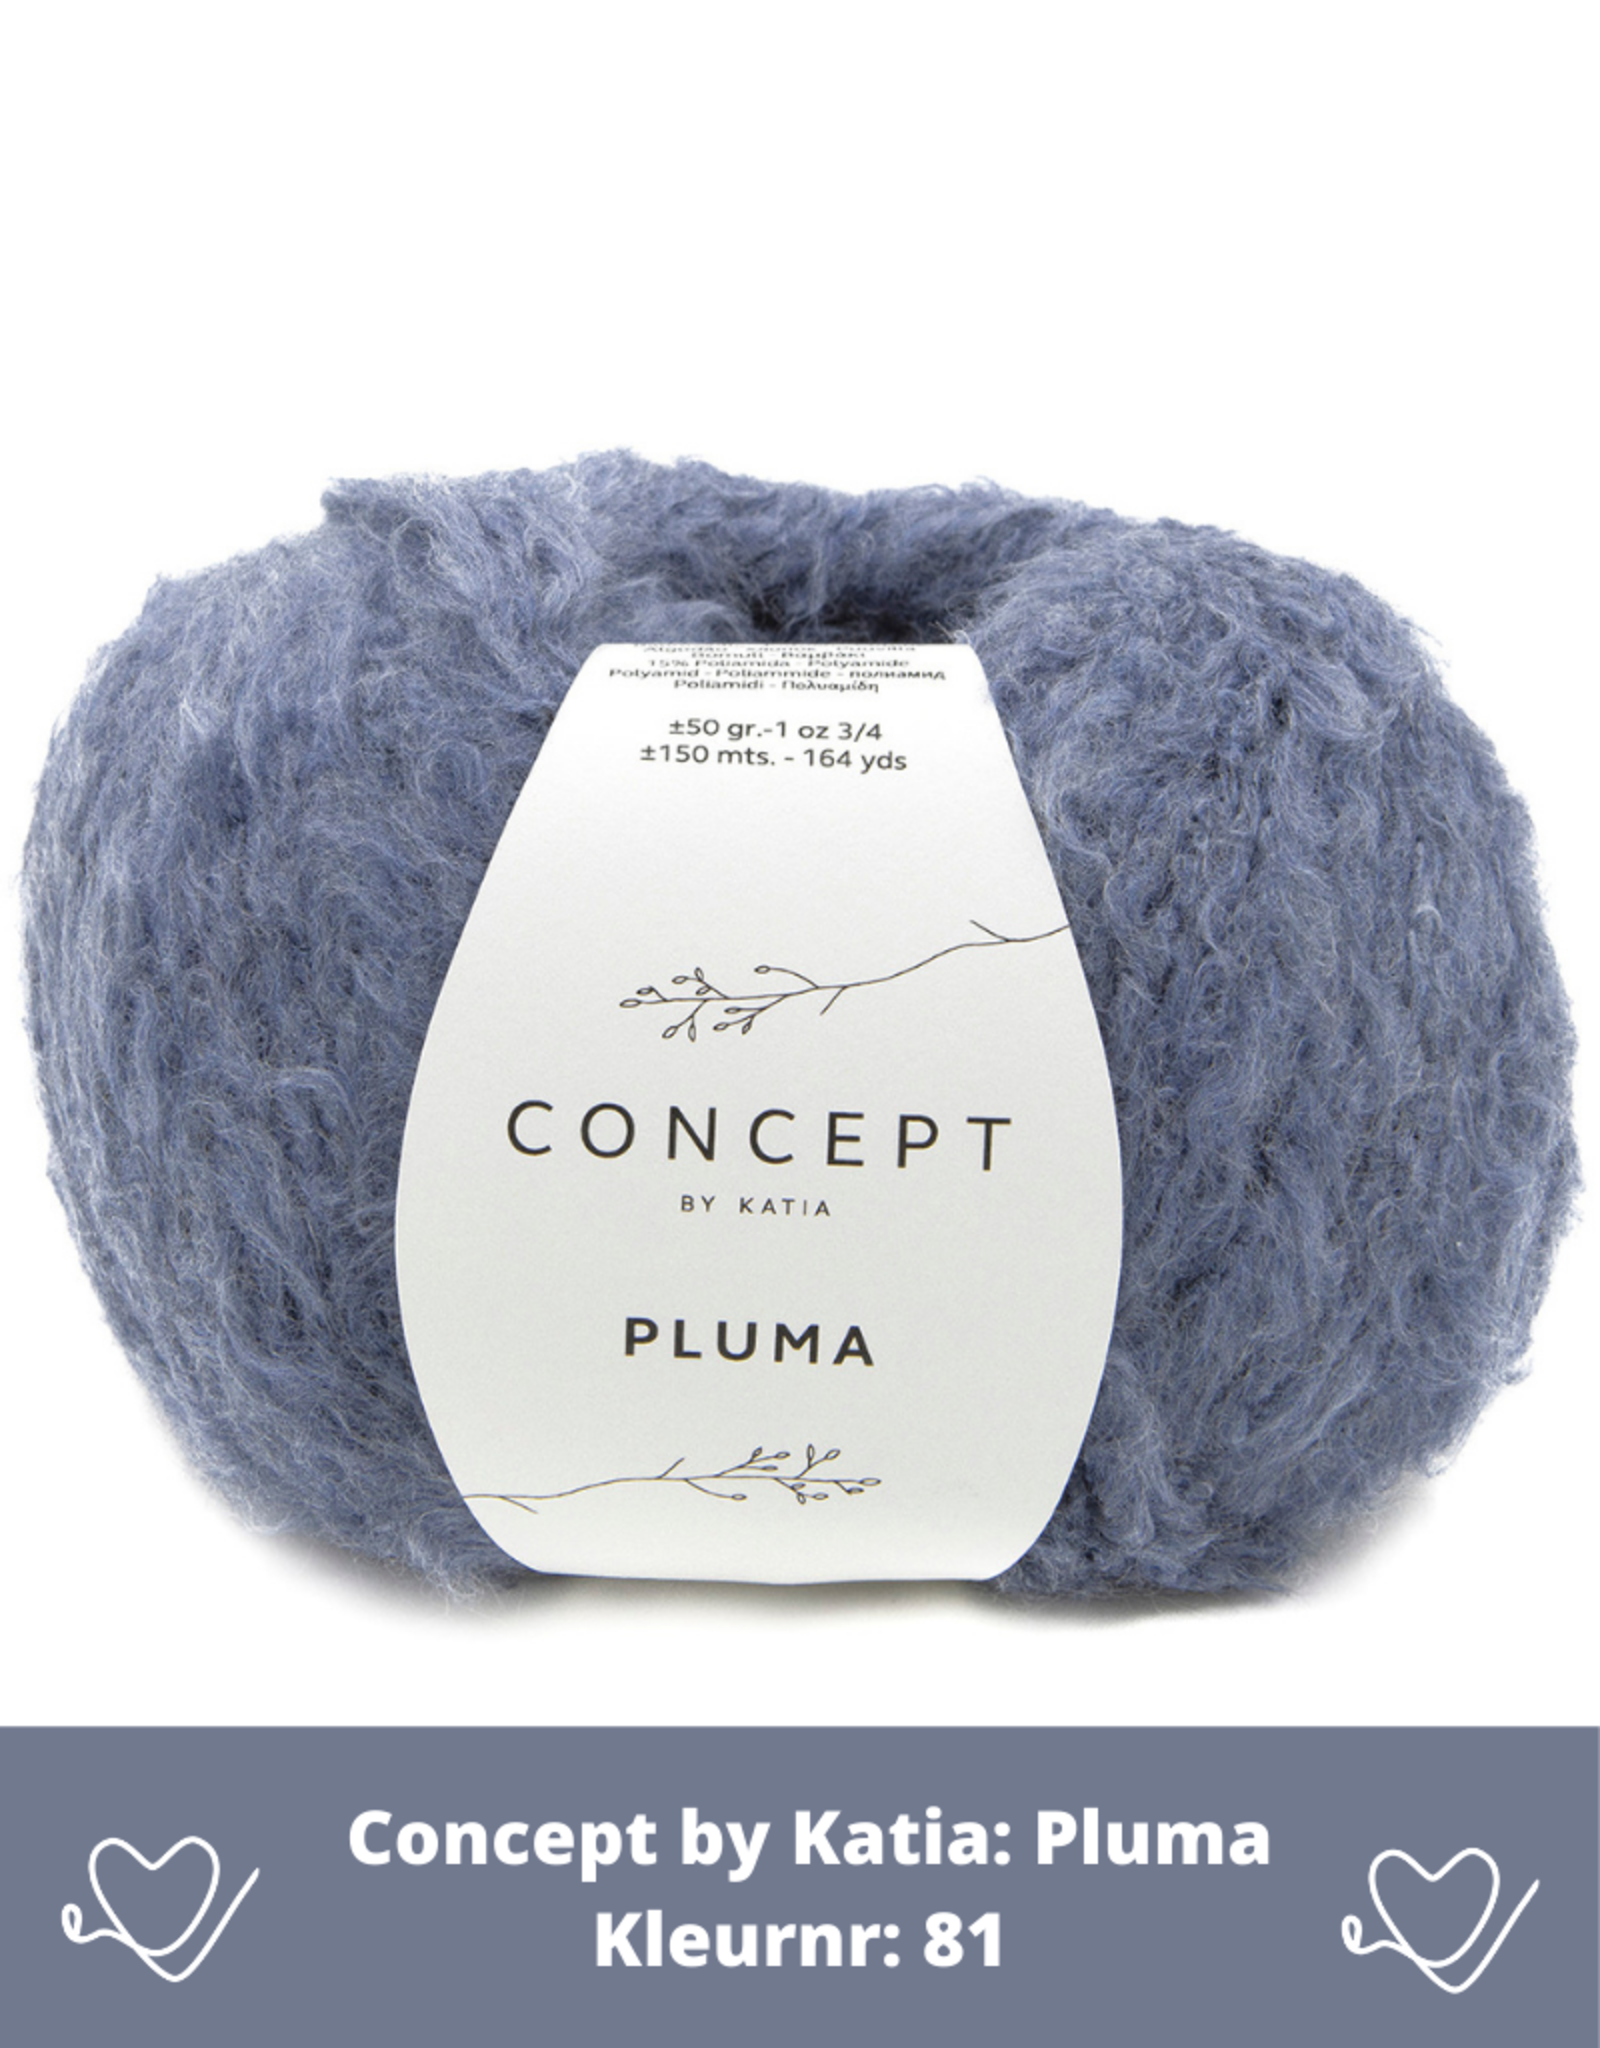 Katia Concept by Katia: Pluma Jeans